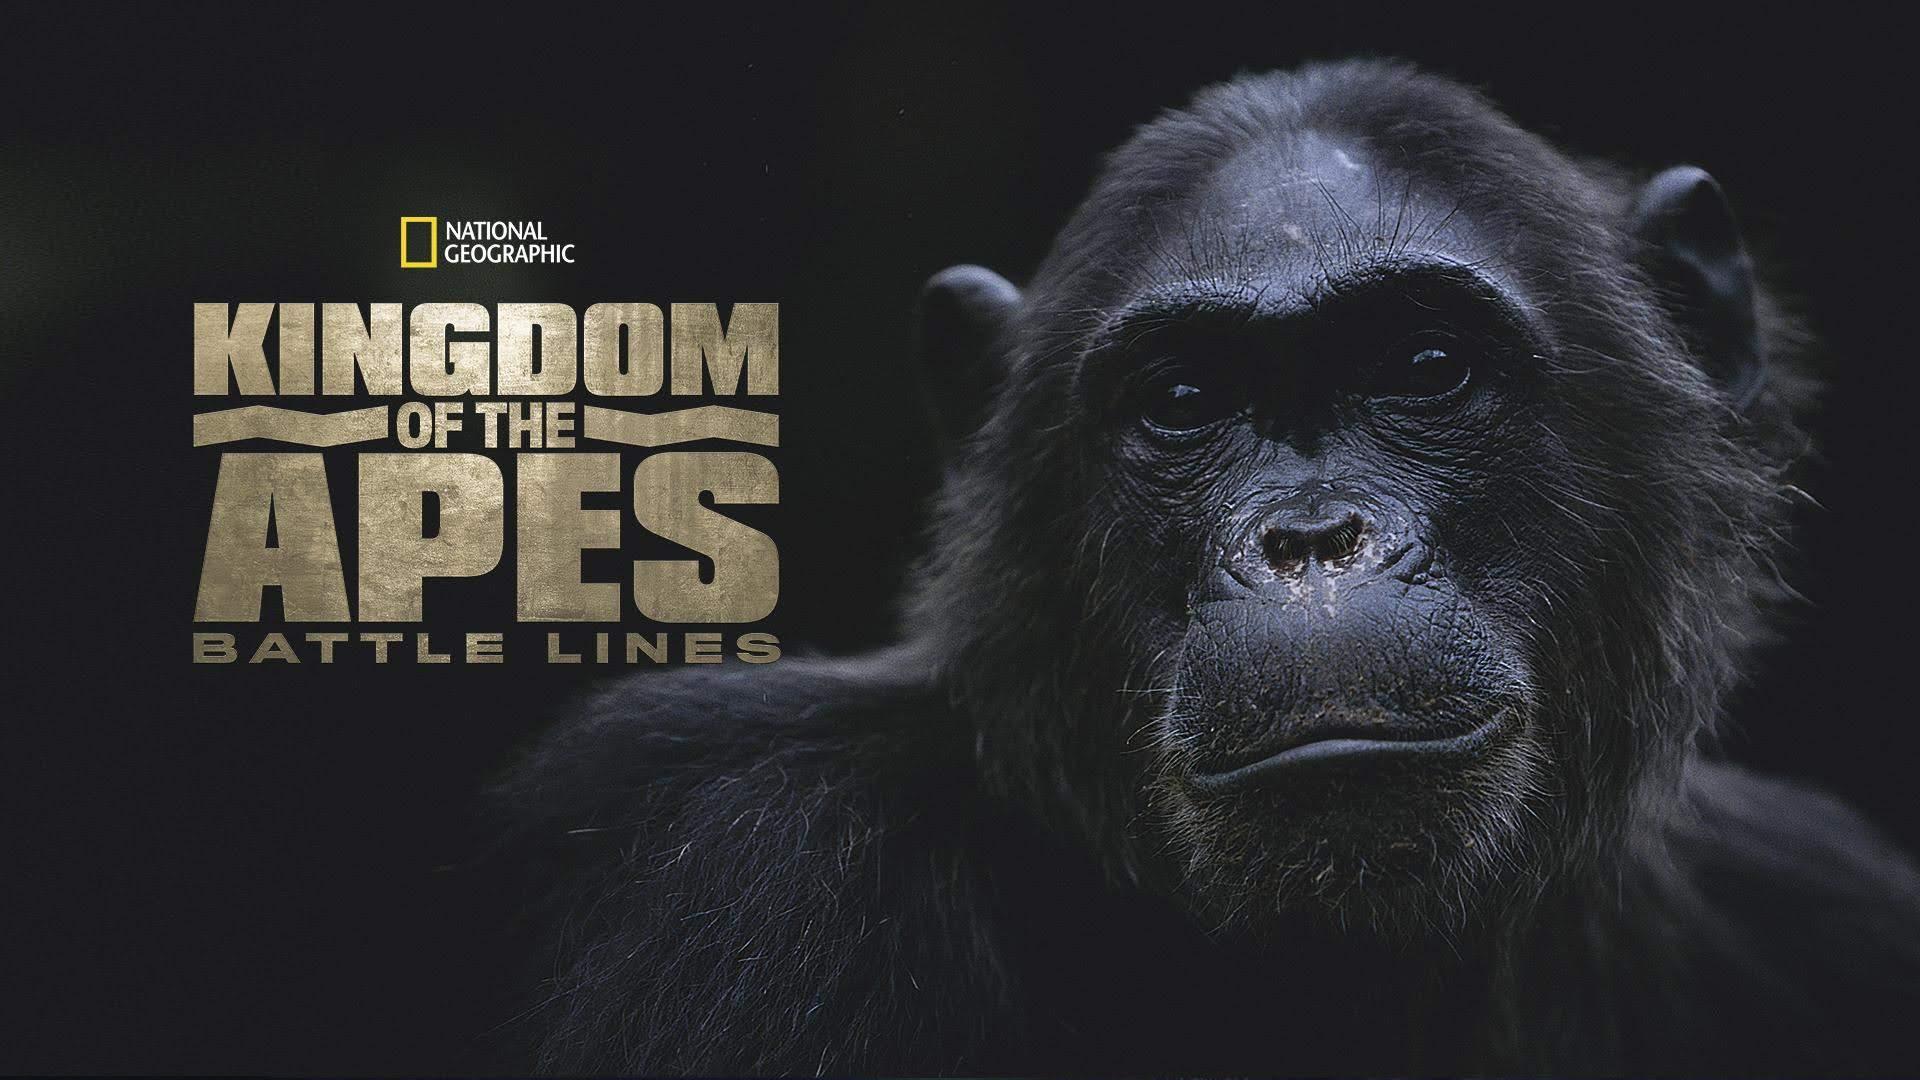 affiche poster royaume singes lignes bataille kingdom apes battle lines nat geo disney